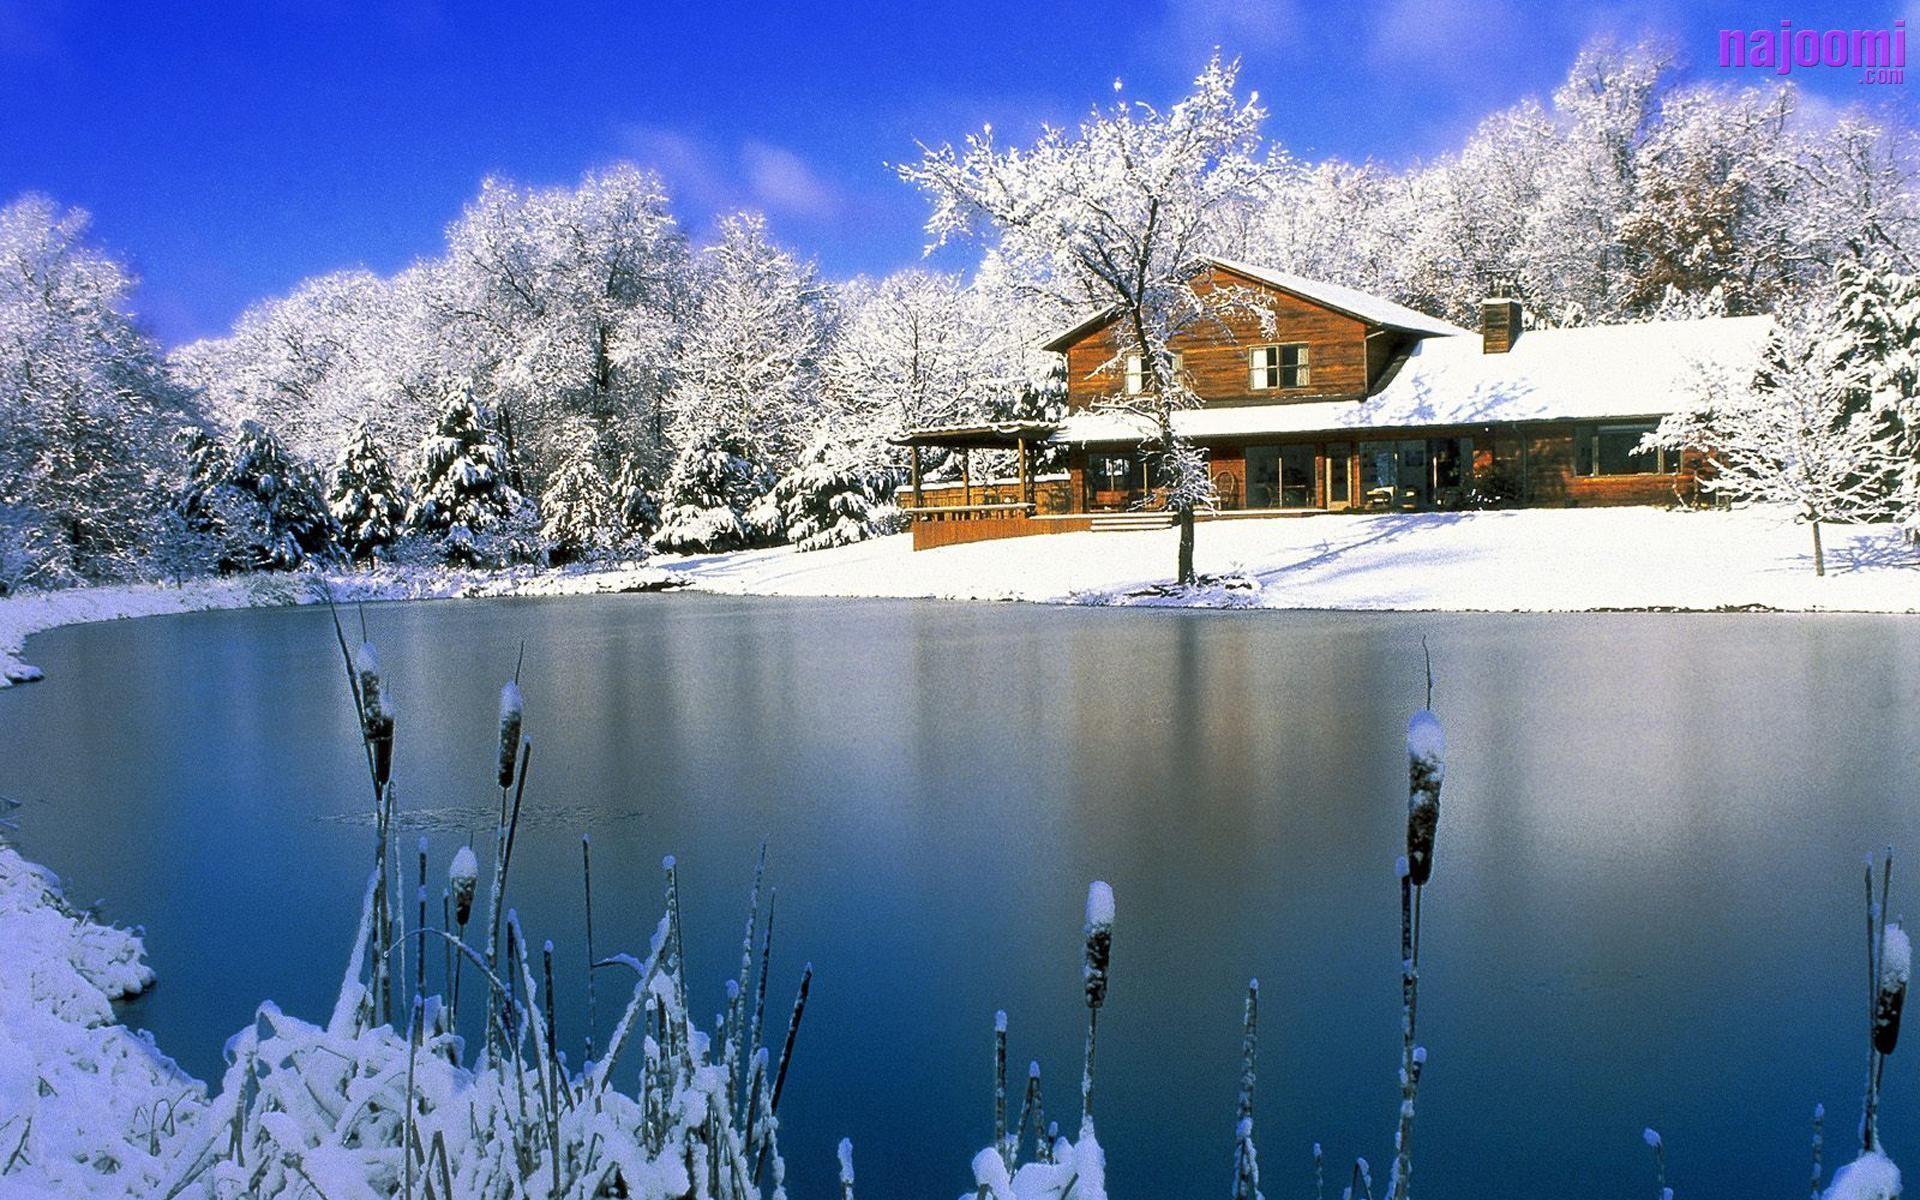 Most Beautiful Snow Scenes Wallpaper | Best Free Wallpaper